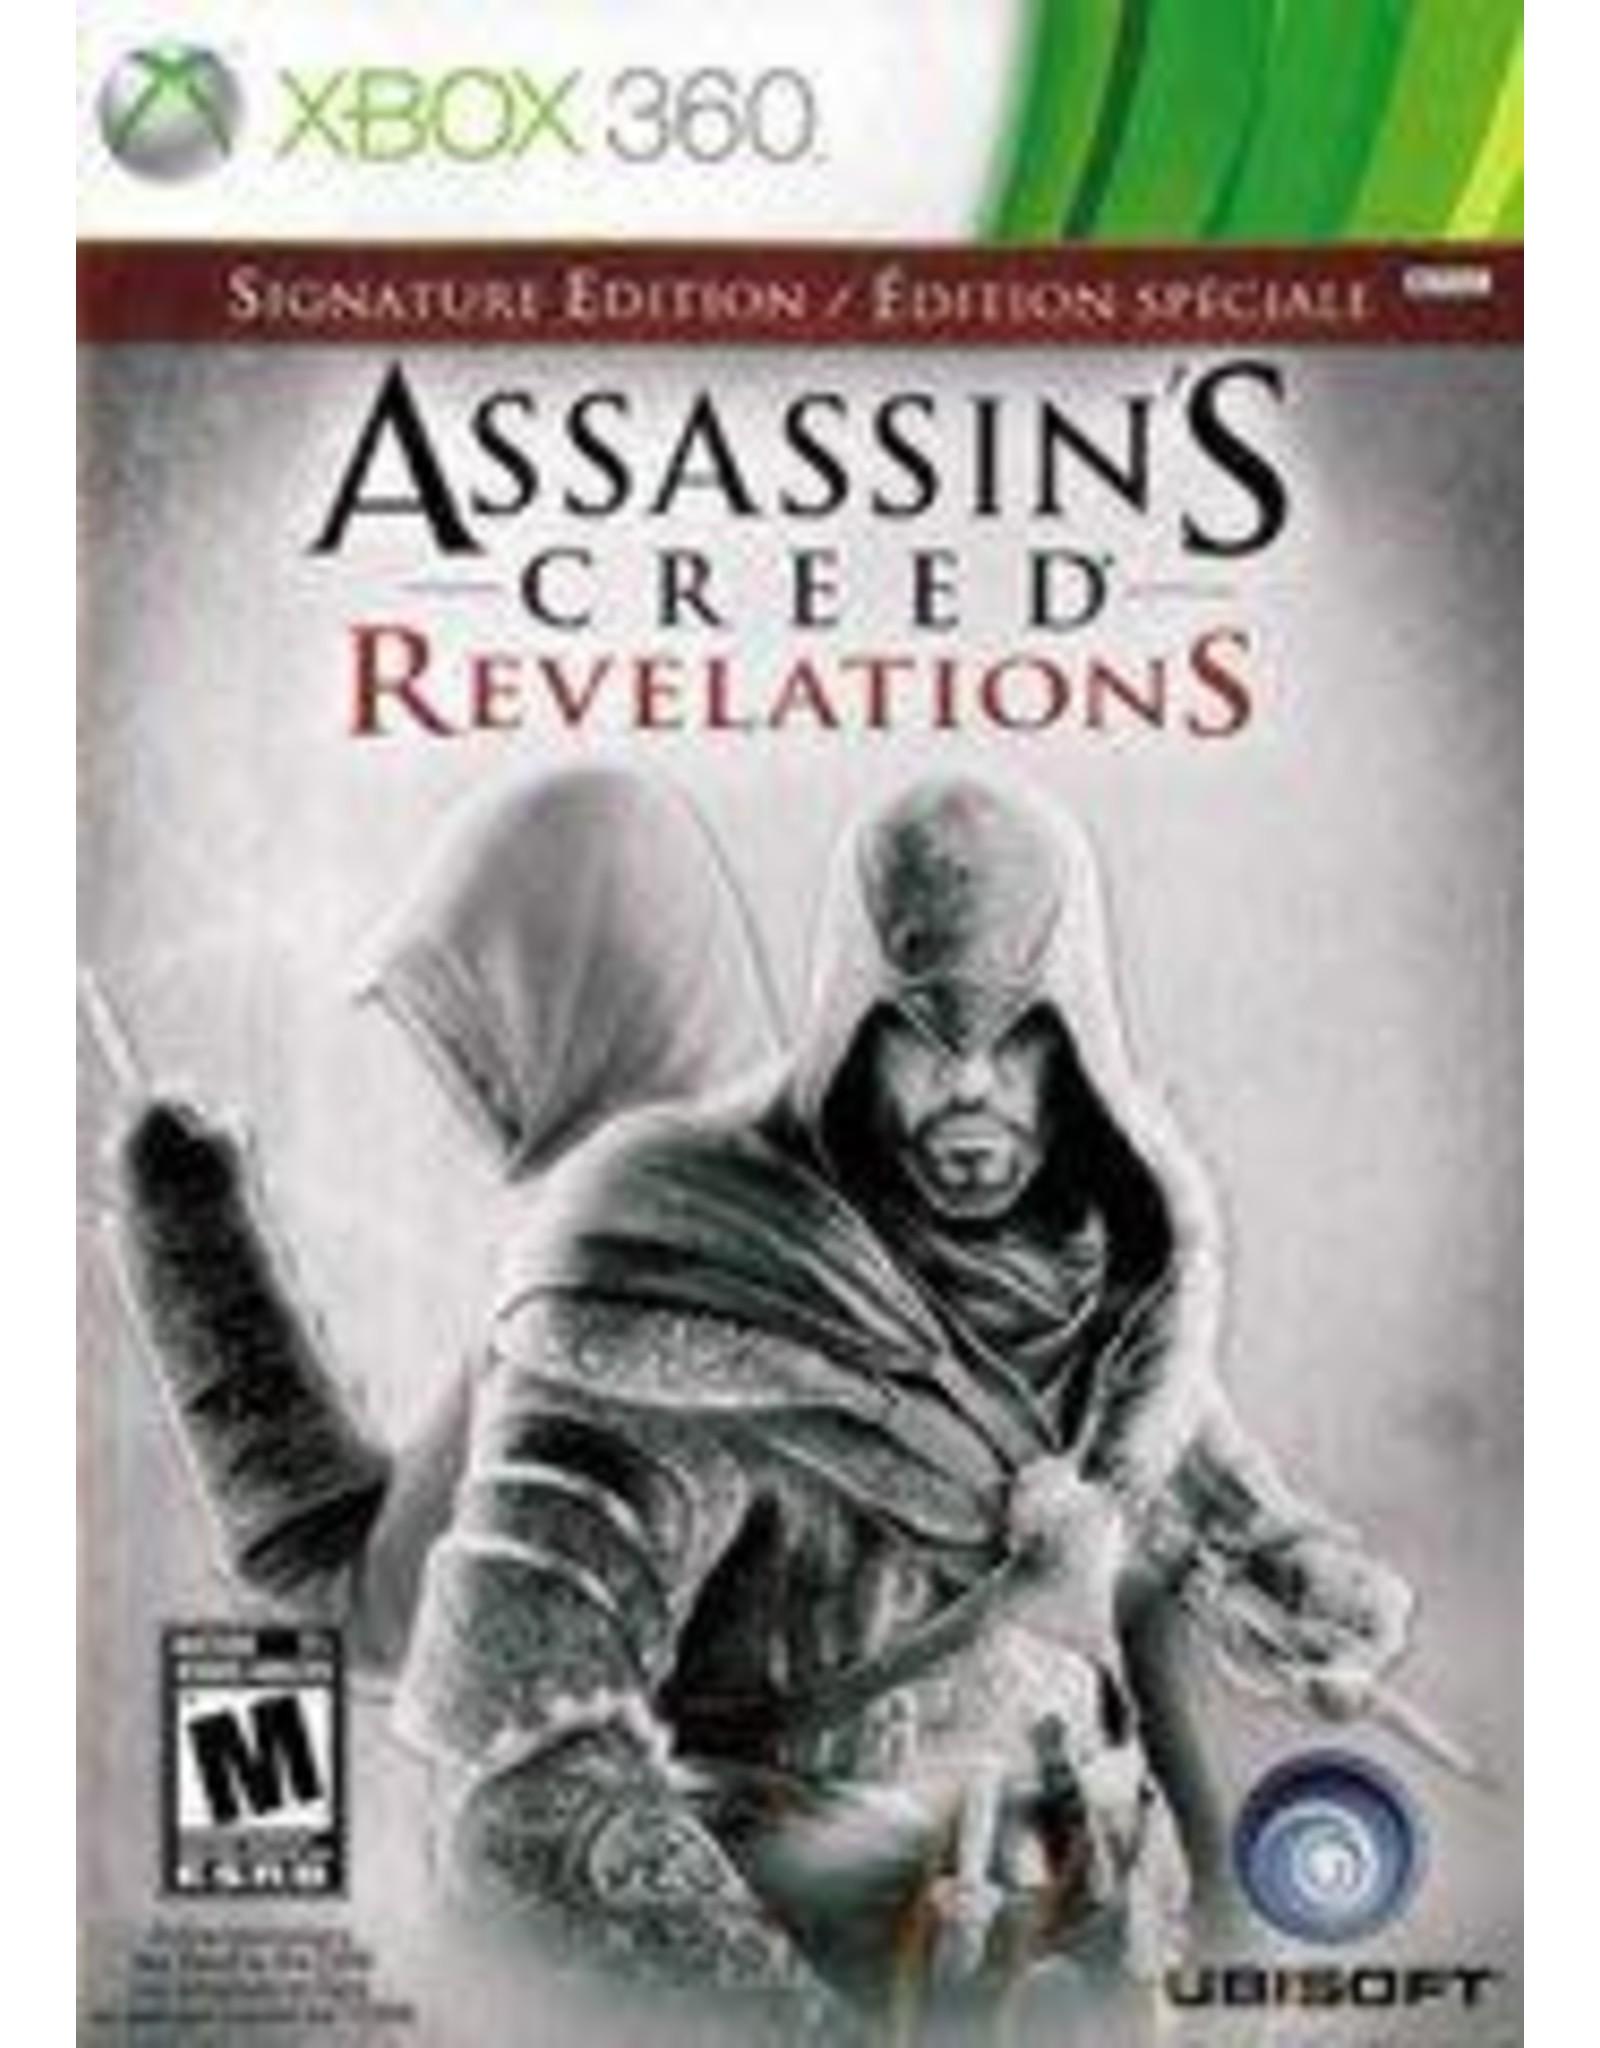 Xbox 360 Assassin's Creed Revelations: Signature Edition (CiB, No DLC)